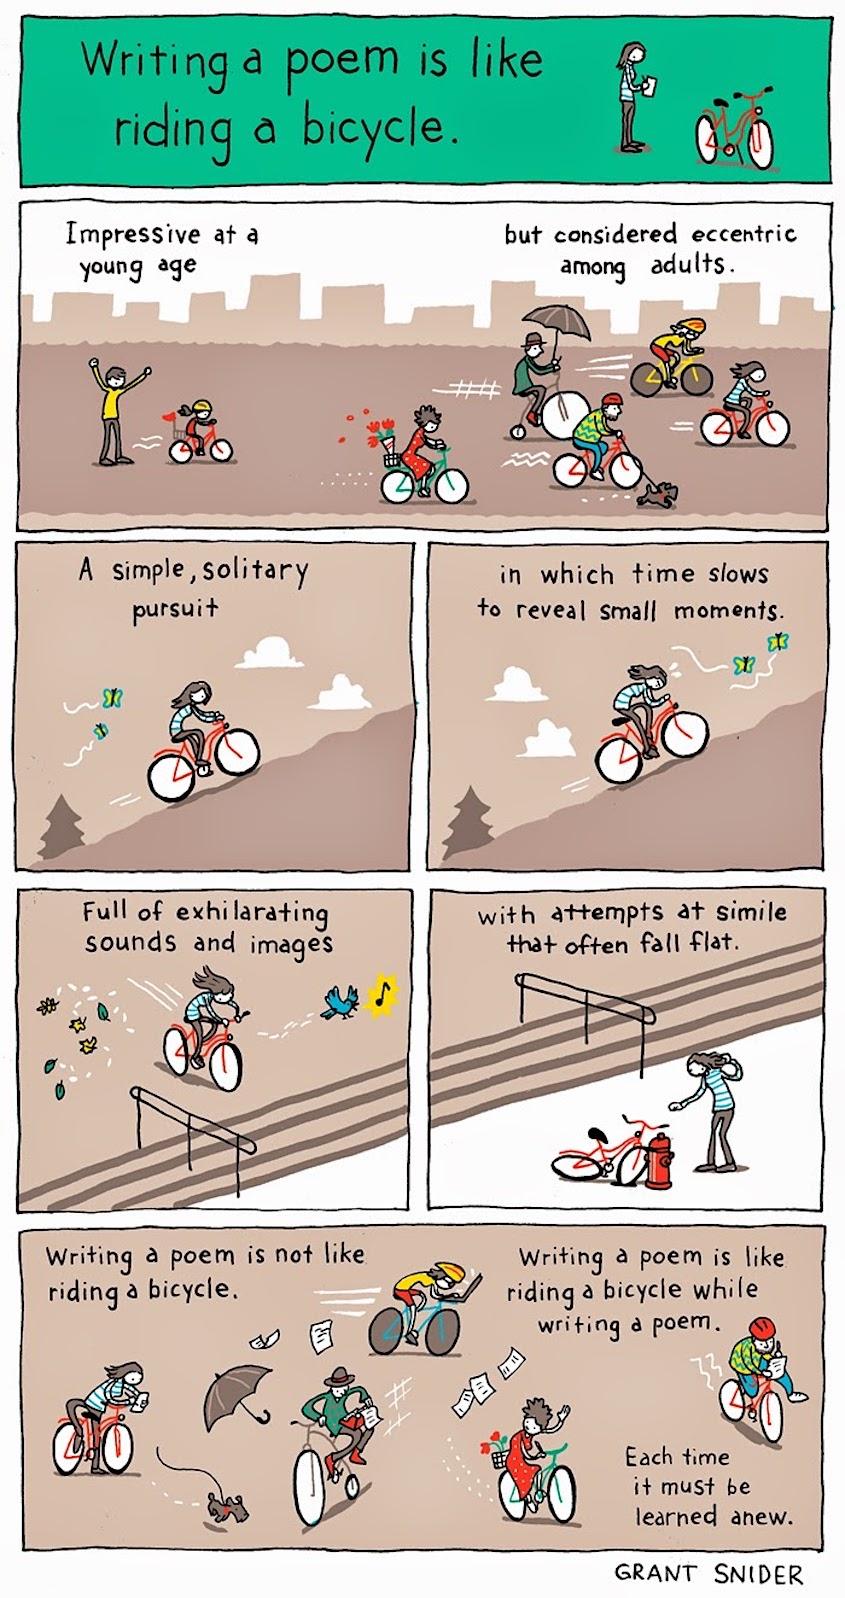 Grant Snider fumetti_urbancycling_5